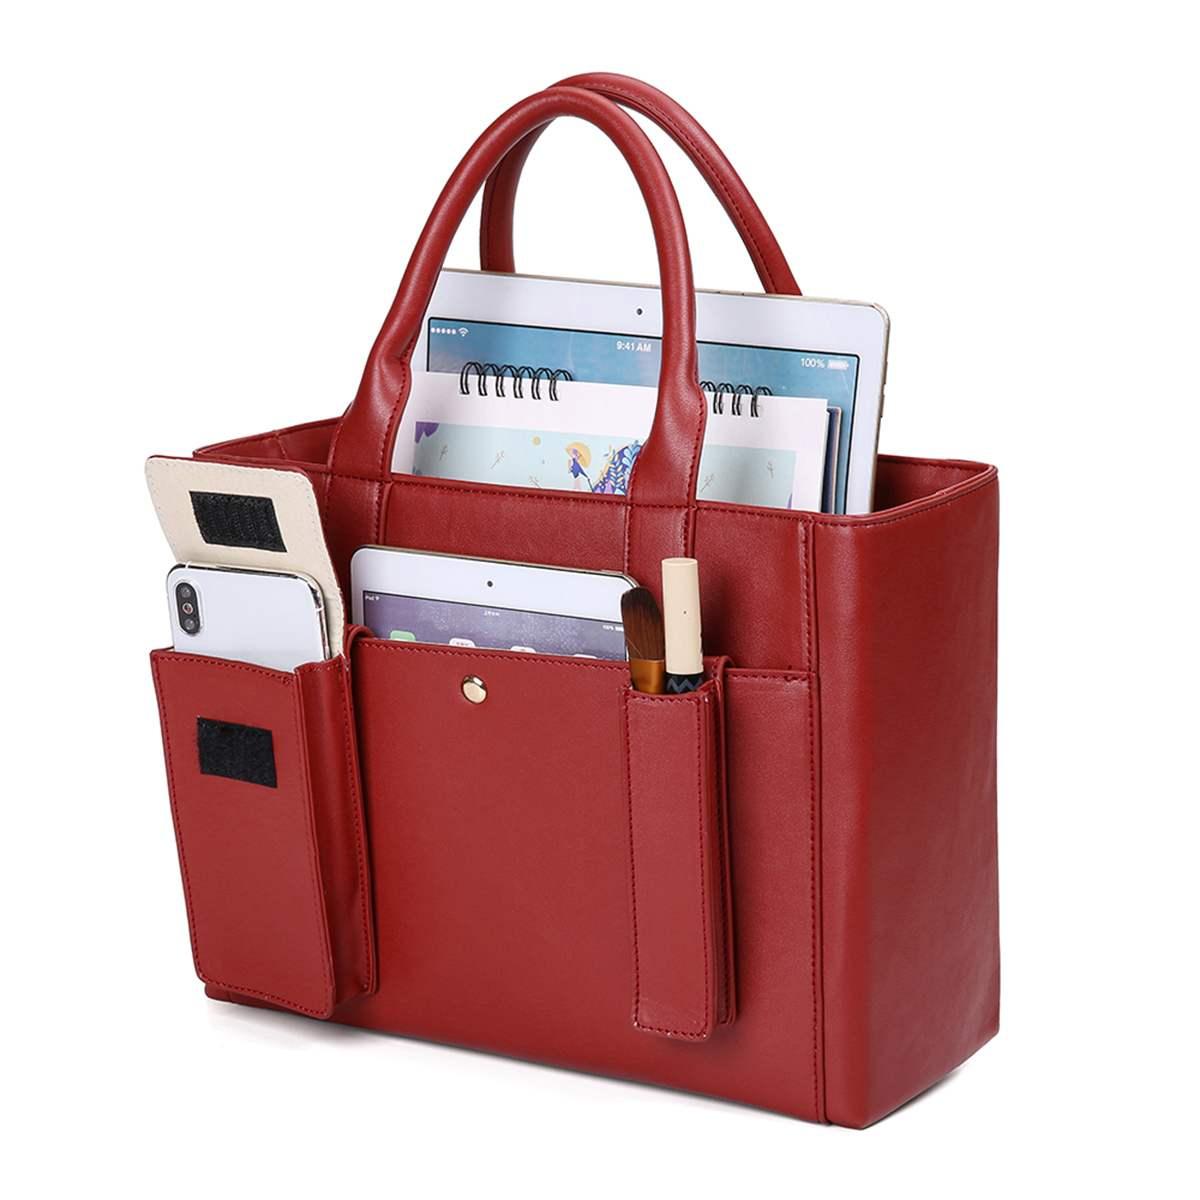 3IN1 Fashion Women Handbag Simple Women Hand Bag Female Organize Bag Leather Multifunction Shoulder Bag Lady Tote Feminine Bolsa